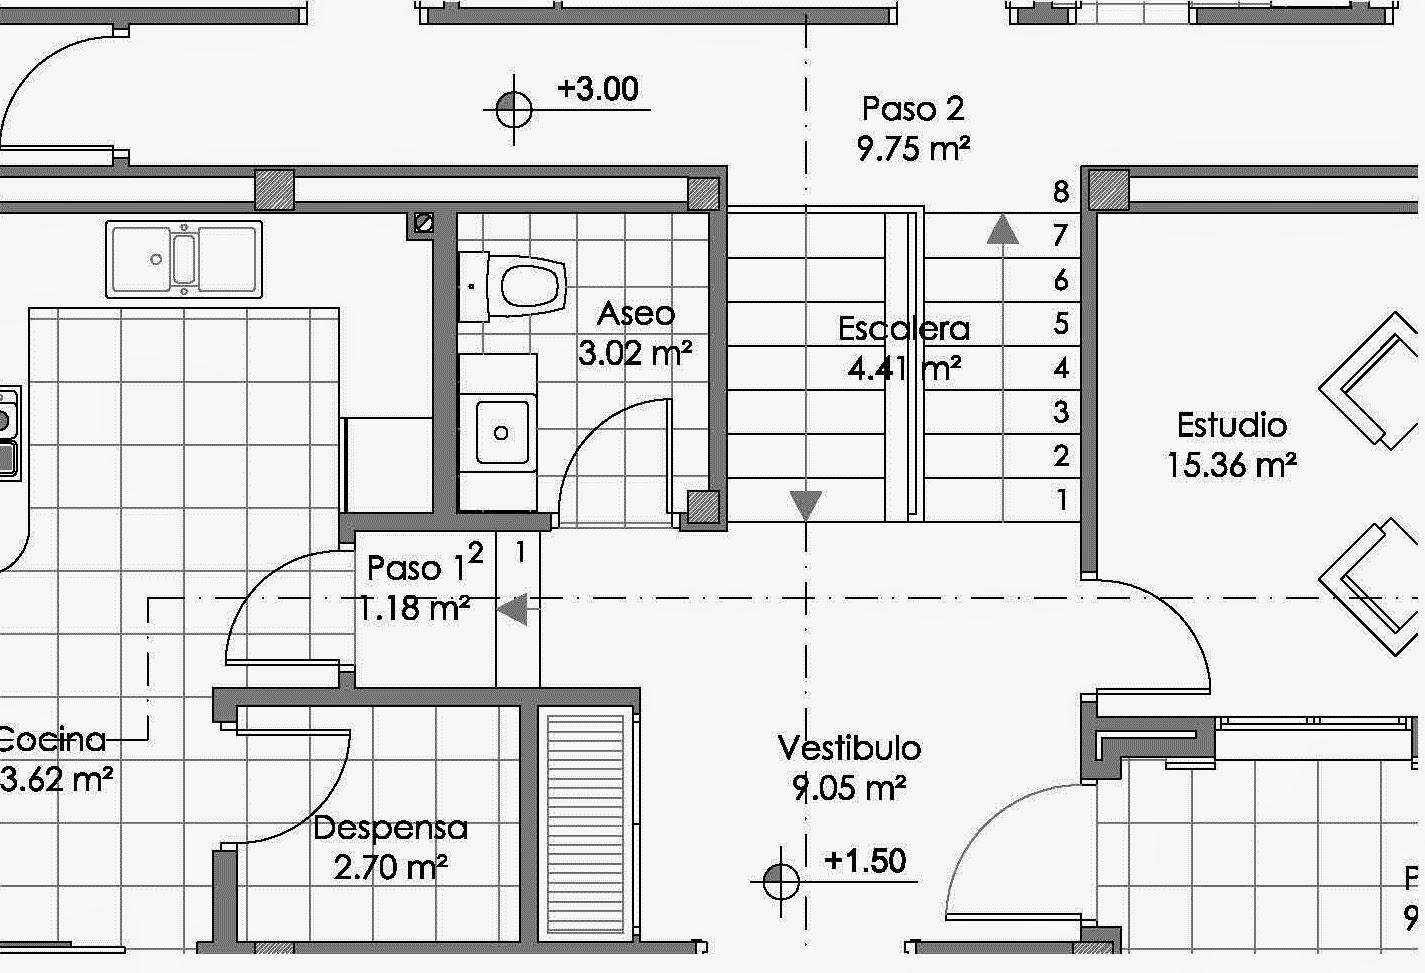 Rc i e s gran v a alicante proyecto 10 planos 7 8 y 9 for Representacion arquitectonica en planos